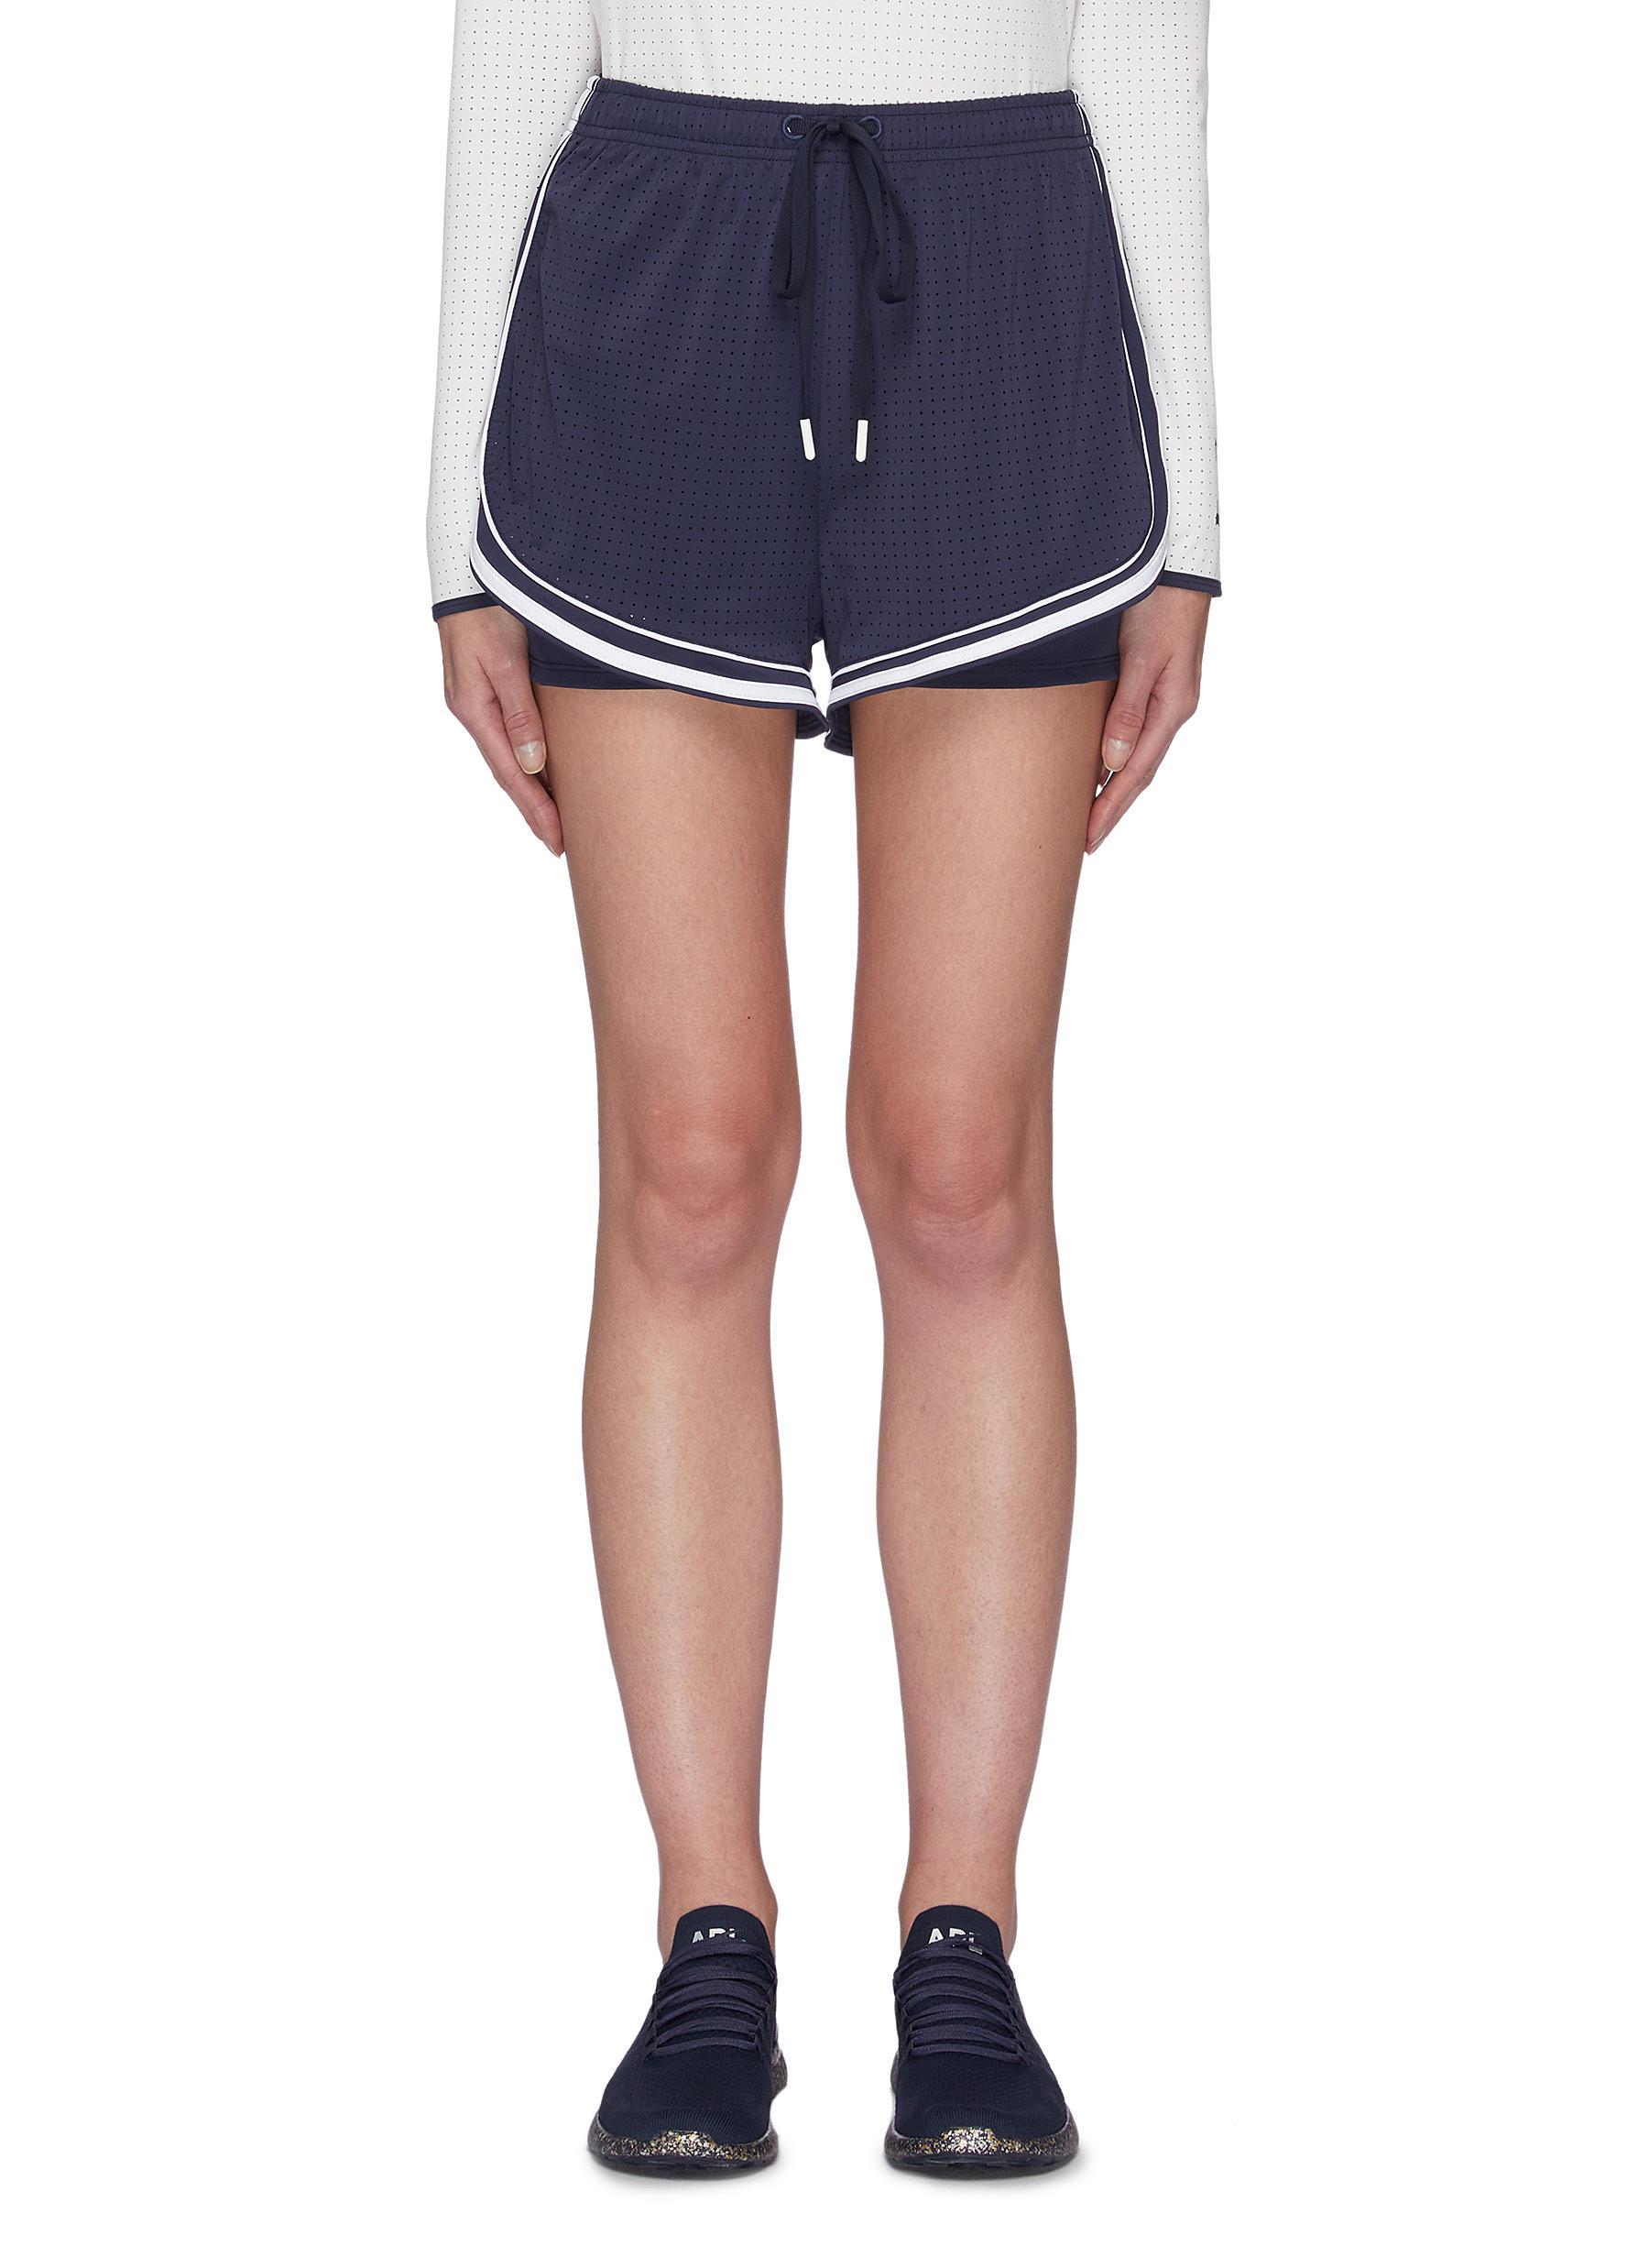 Buy The Upside Pants & Shorts 'Eddie' Performance Shorts